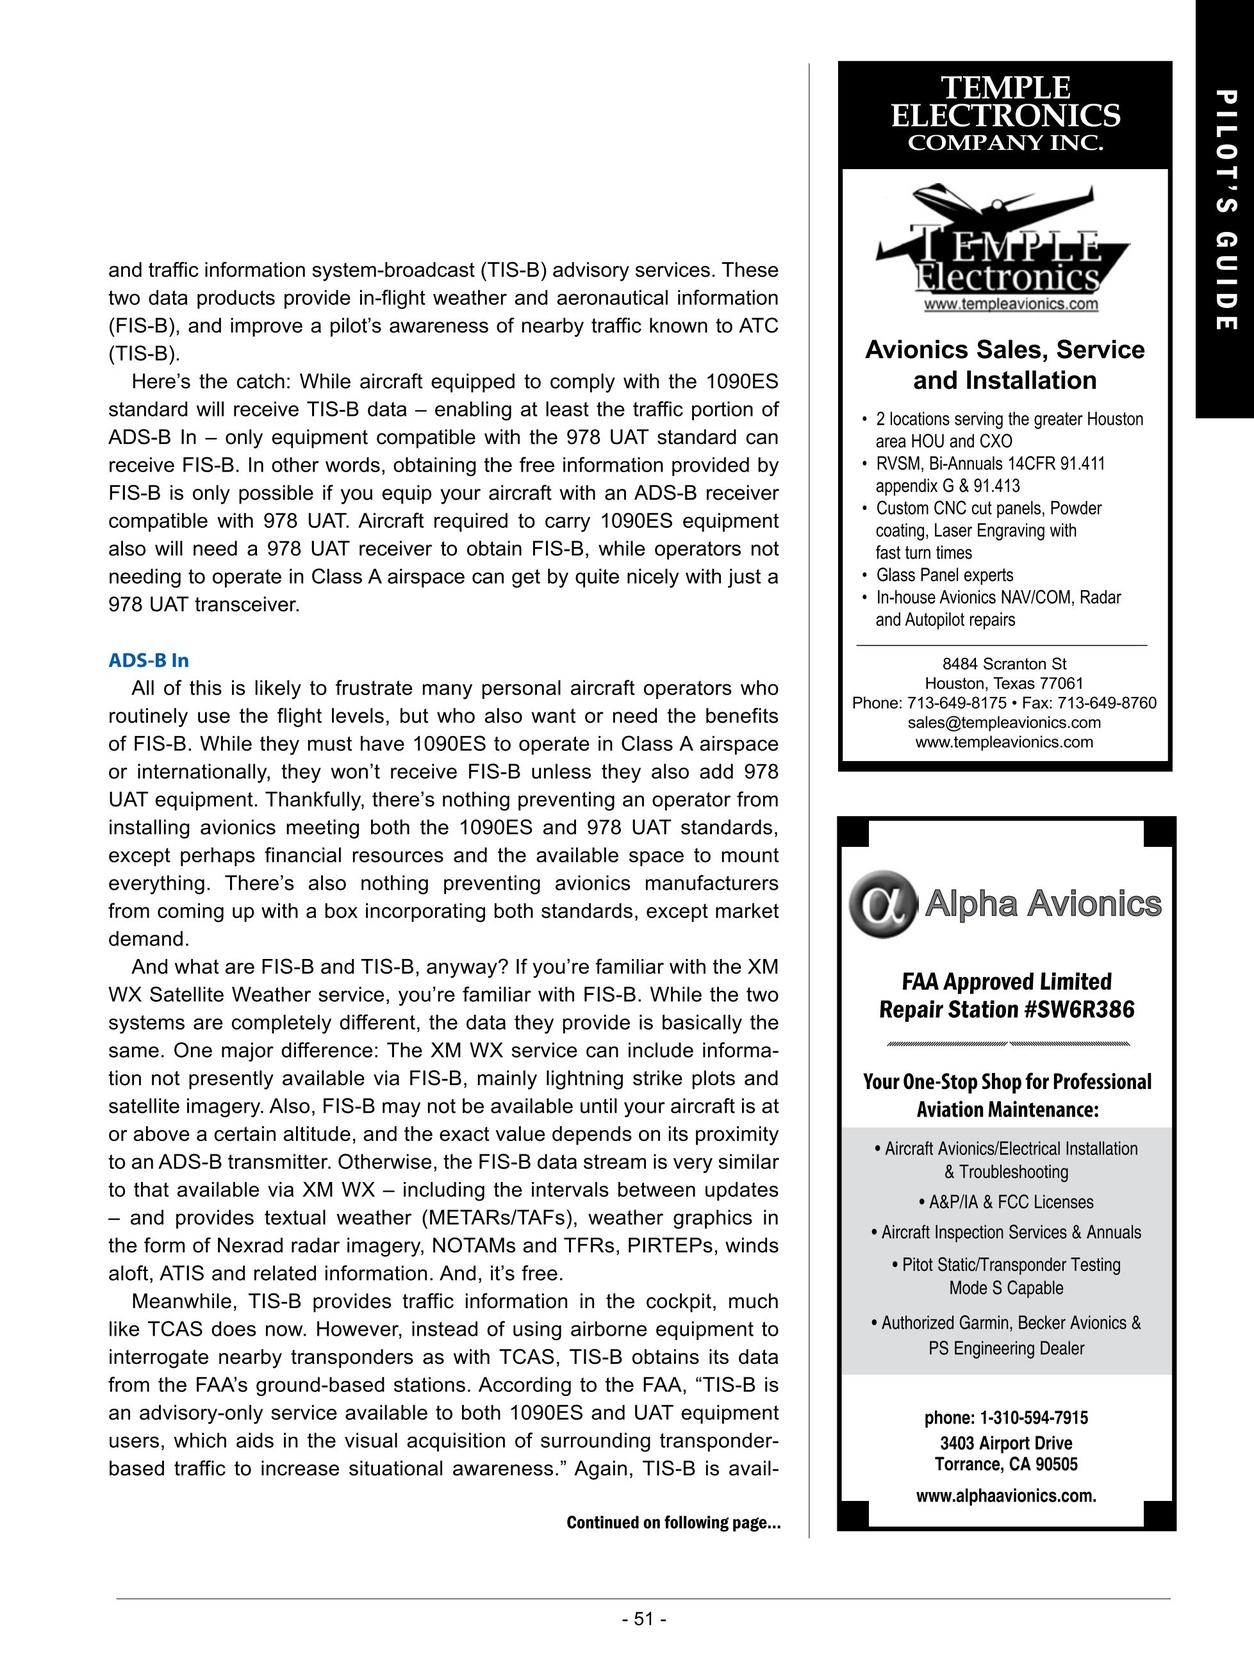 Pilot's Guide to Avionics 2012-2013